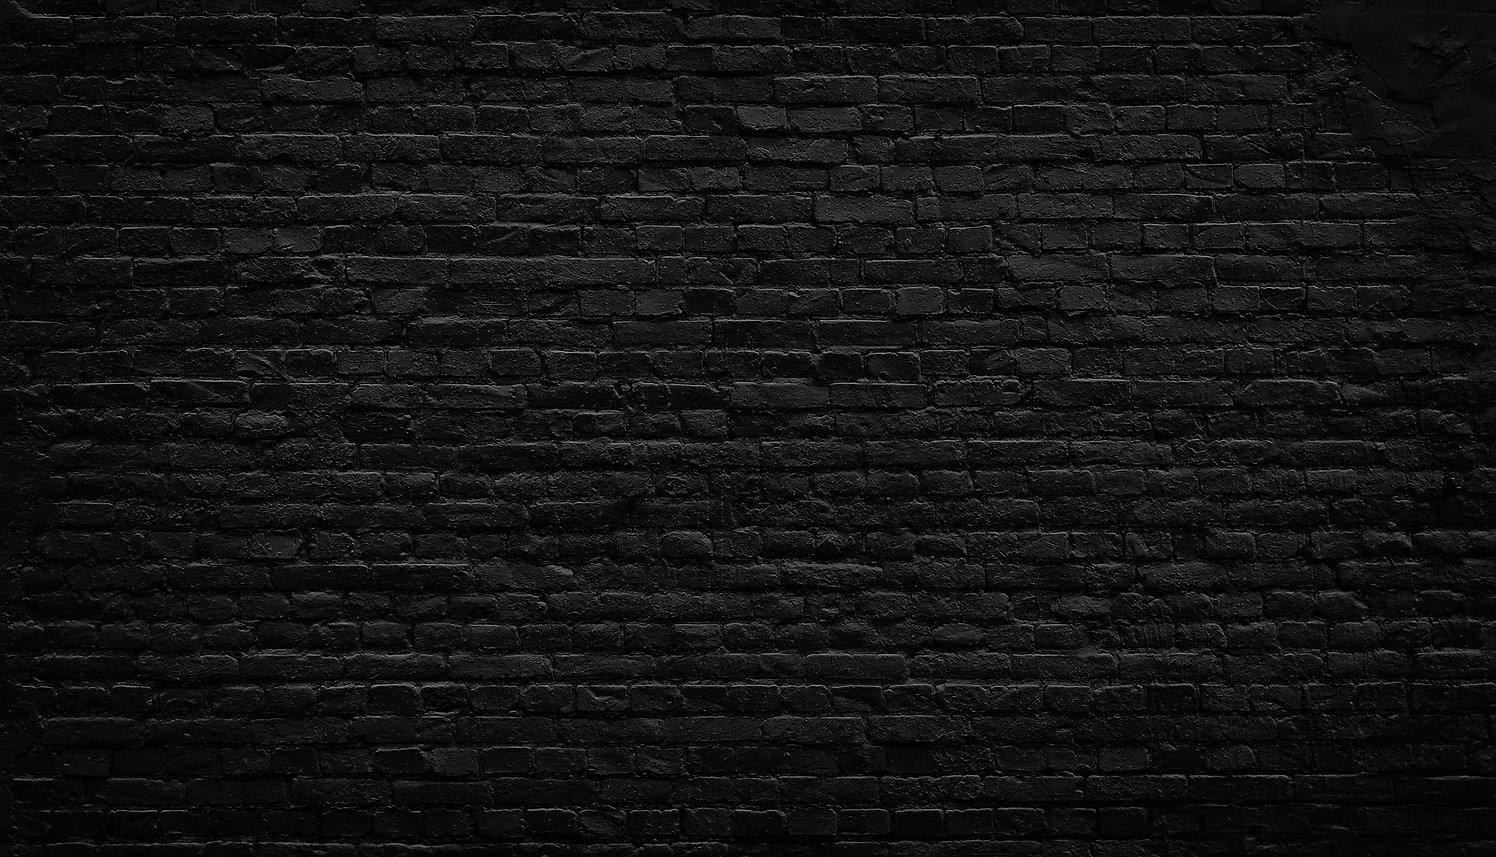 BlackBricks.jpg